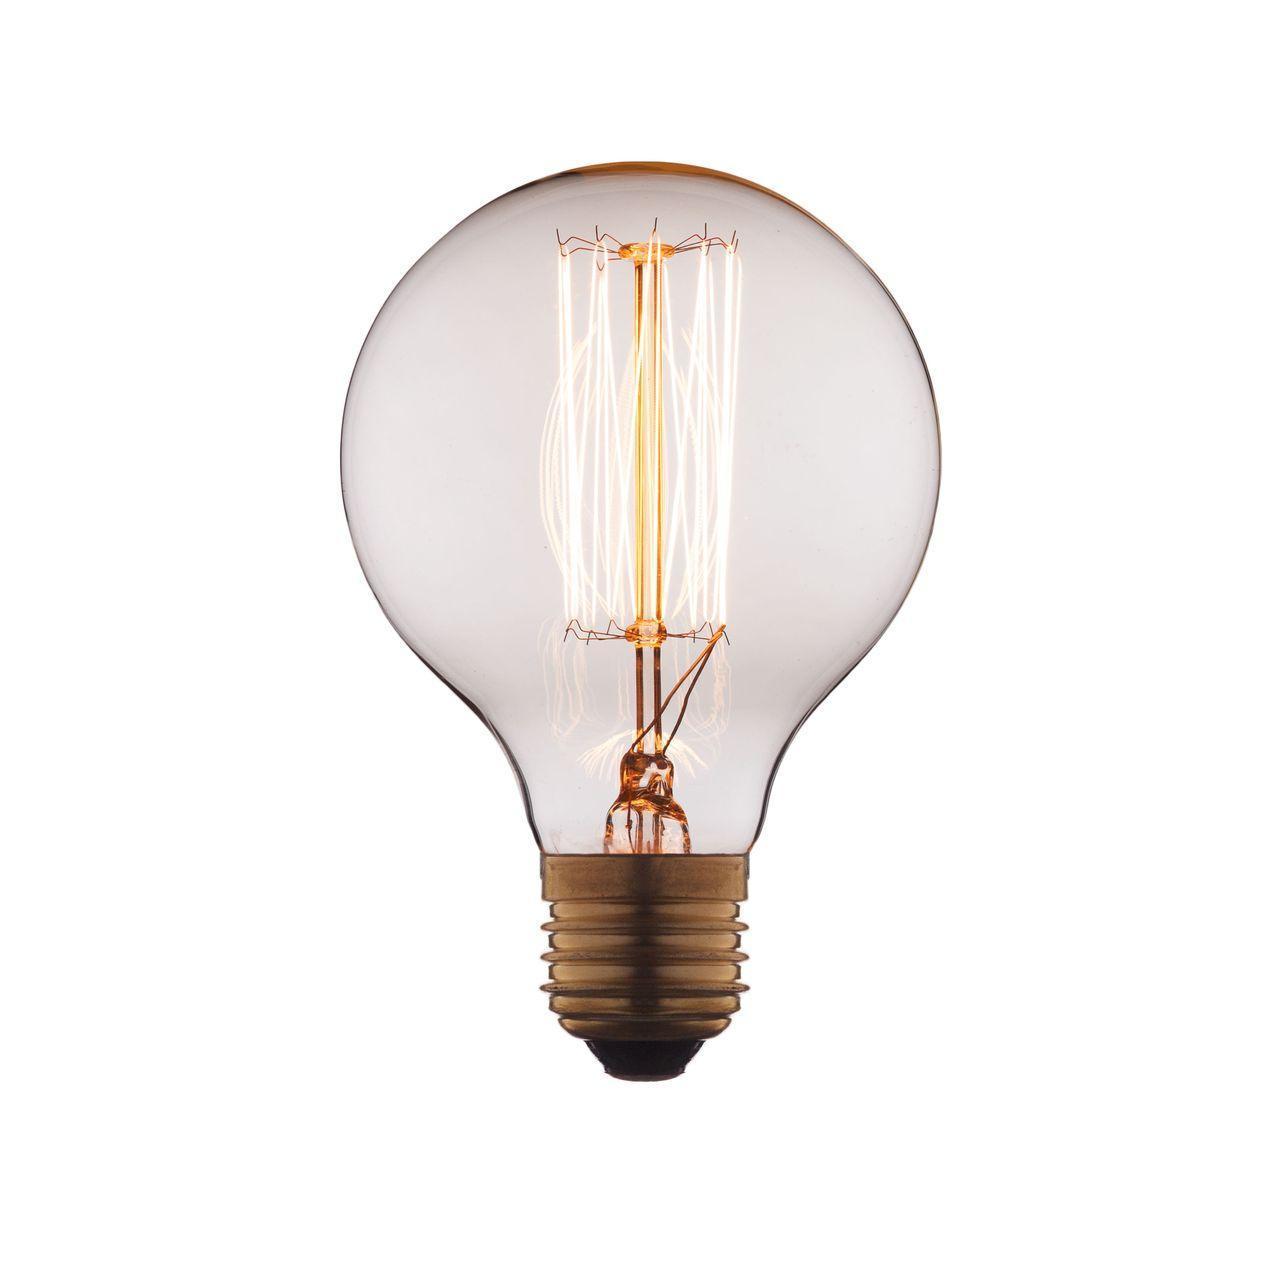 Лампа накаливания E27 60W прозрачная G8060 цена